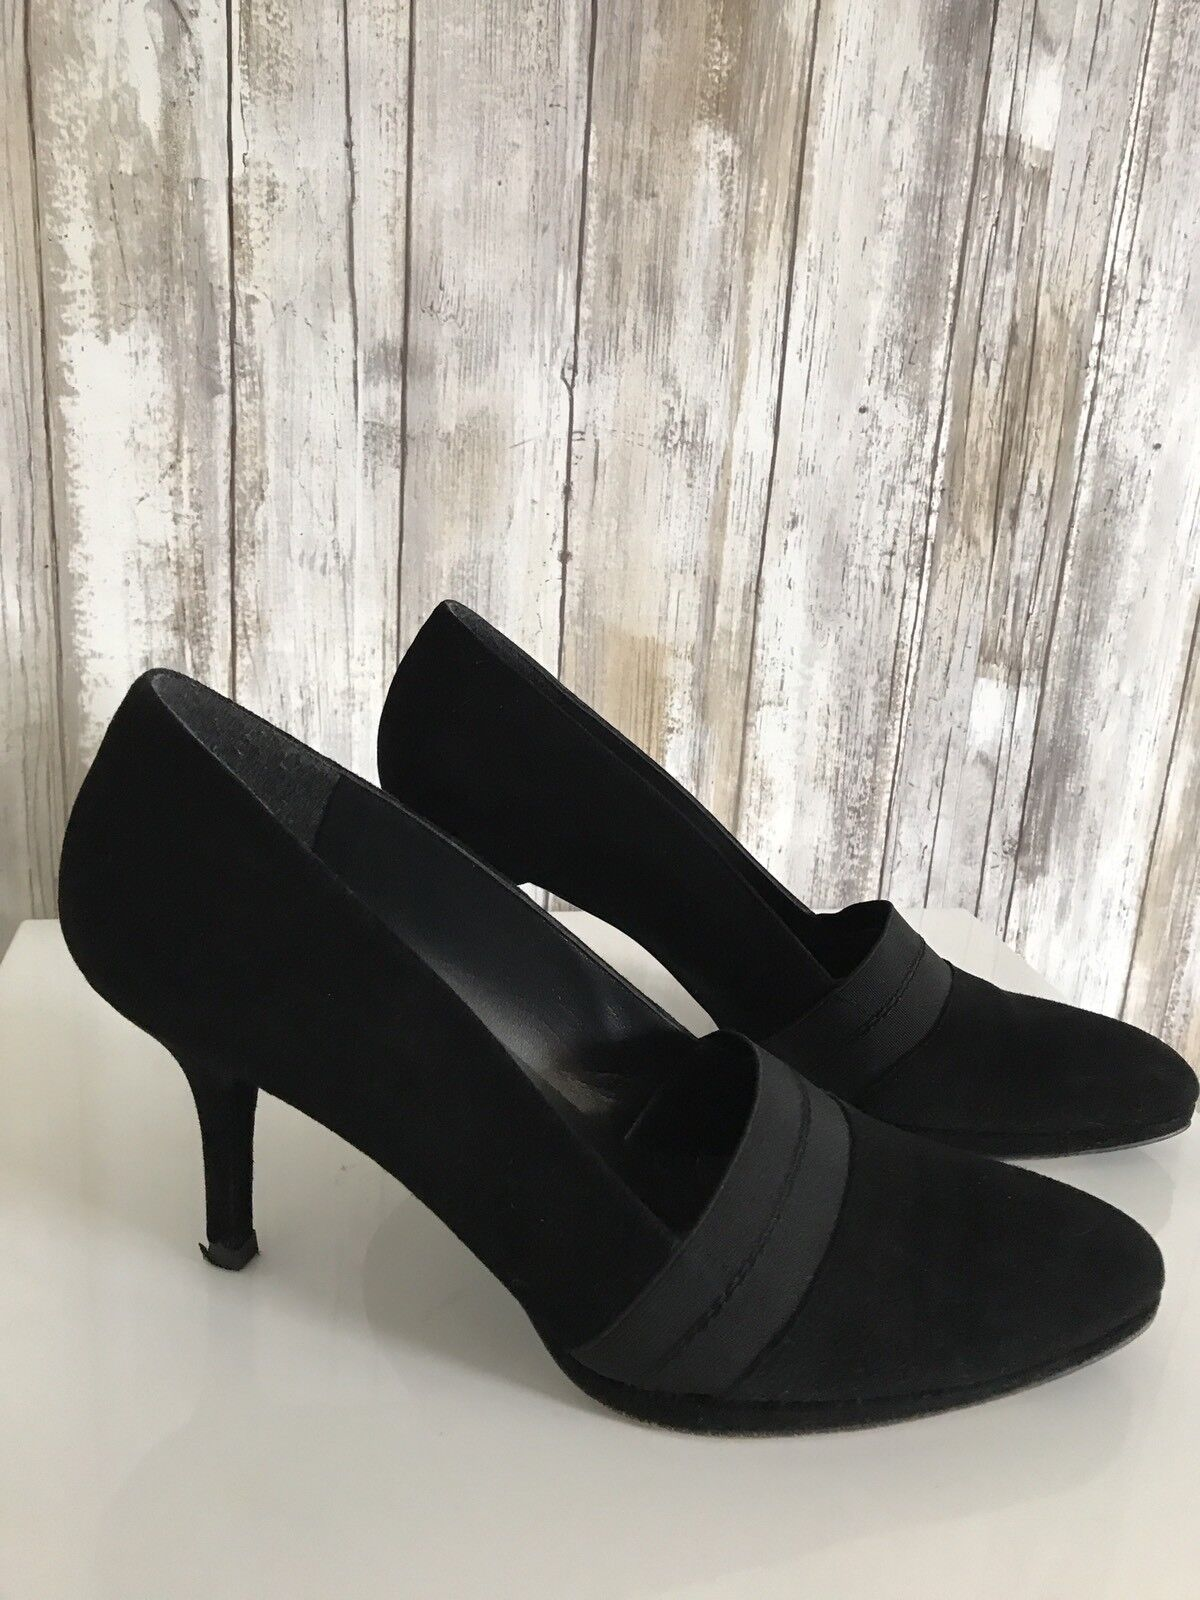 la migliore offerta del negozio online Stuart Weitzman nero Suede Elastic Elastic Elastic Pumps Heels Fall Slip On Show 10 M  comodamente